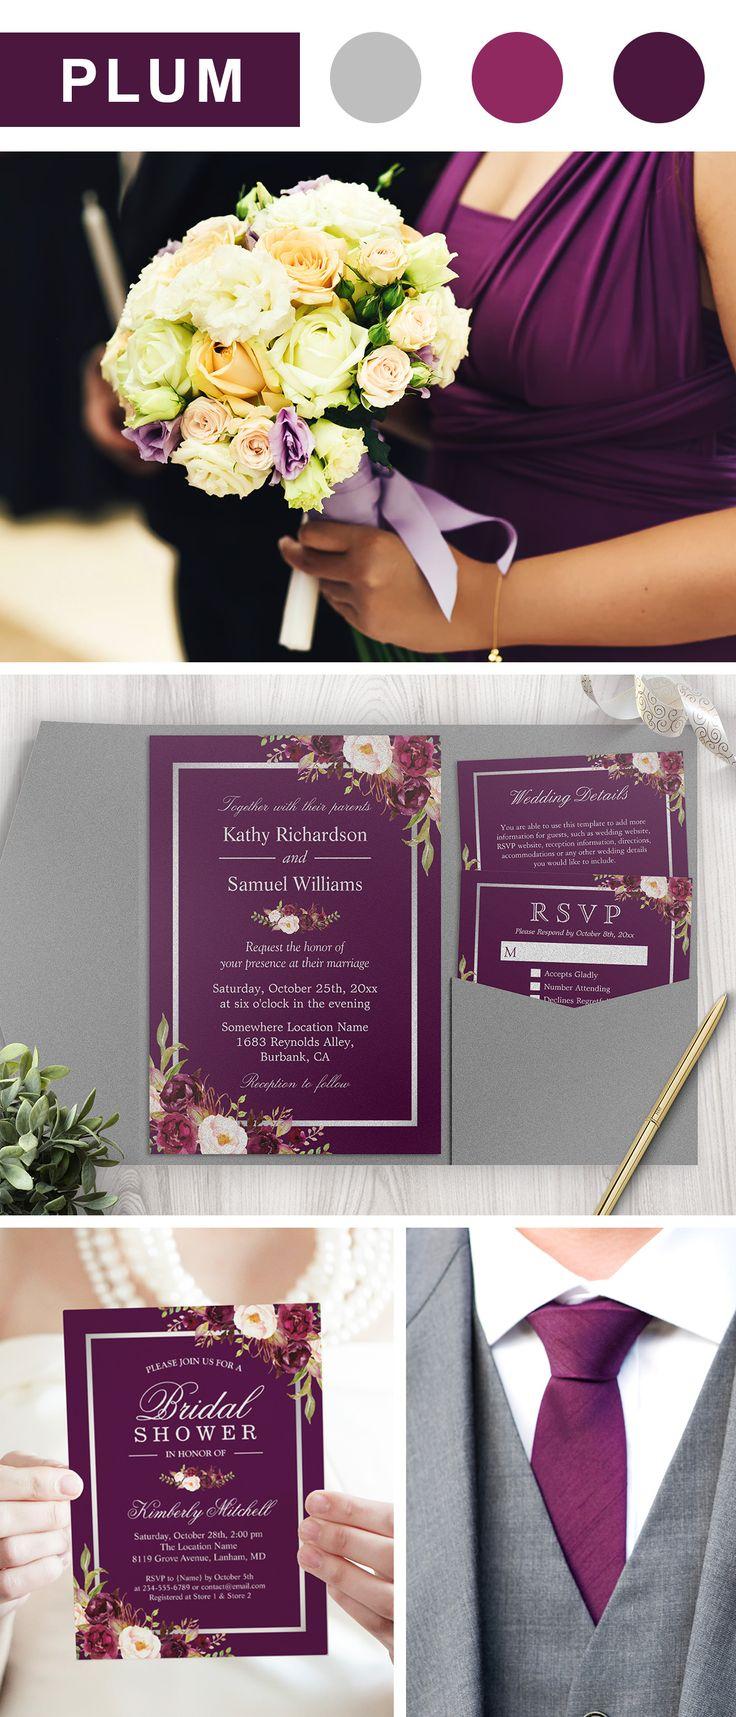 Purple hydrangea wedding invitation sample - Plum Purple And Silver Gray Wedding Color Ideas And Wedding Invitation Suite For Fall And Winter